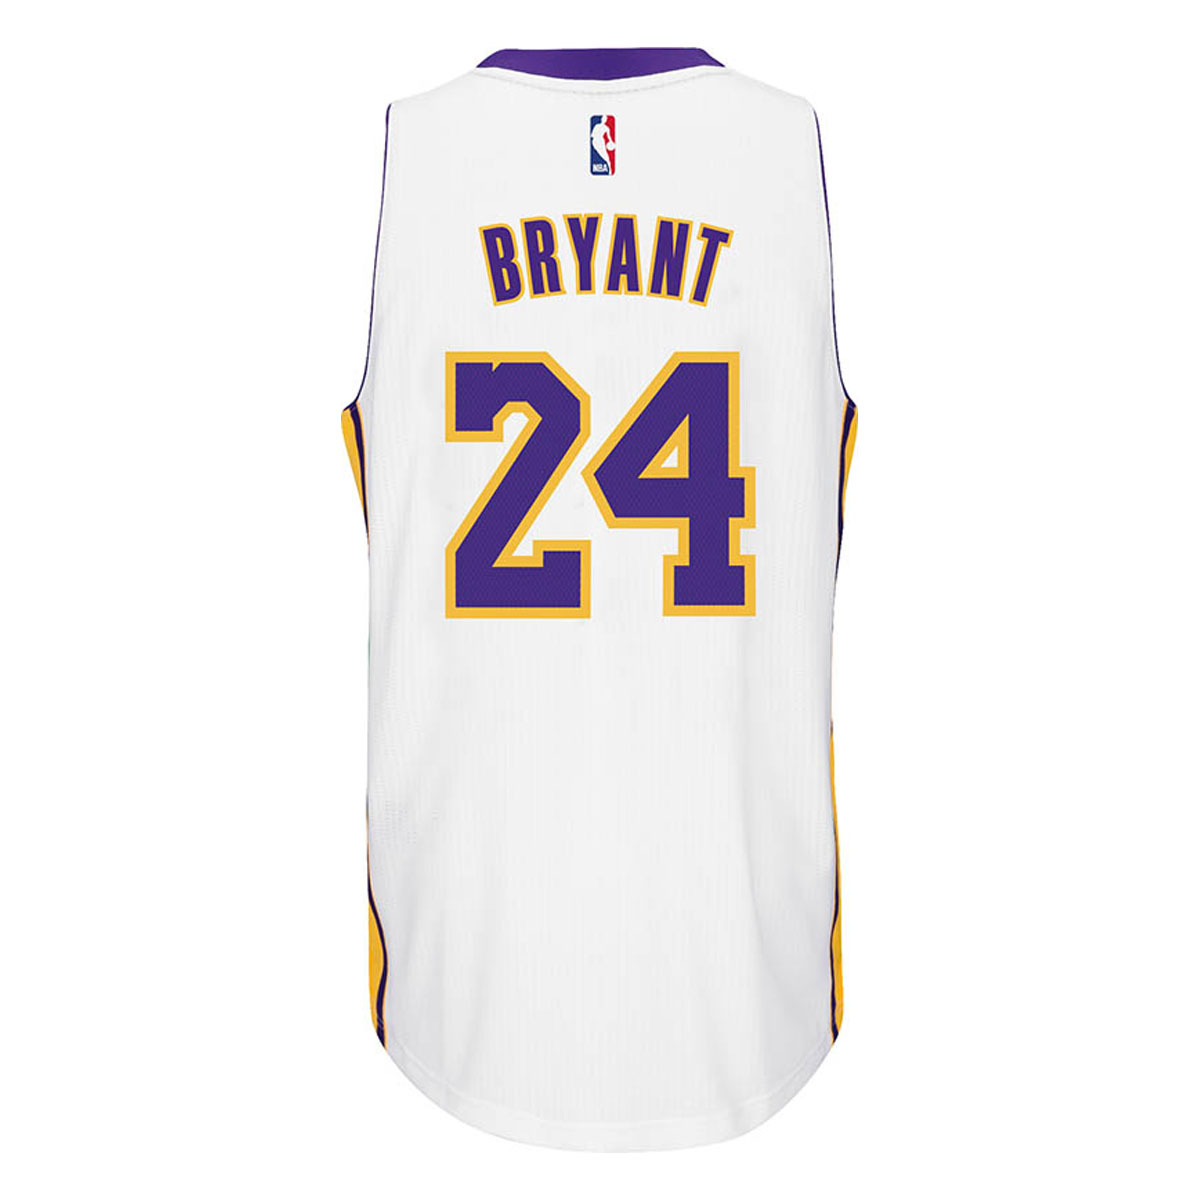 Los Angeles Lakers Adidas NBA Kobe Bryant #24 Alternate S...